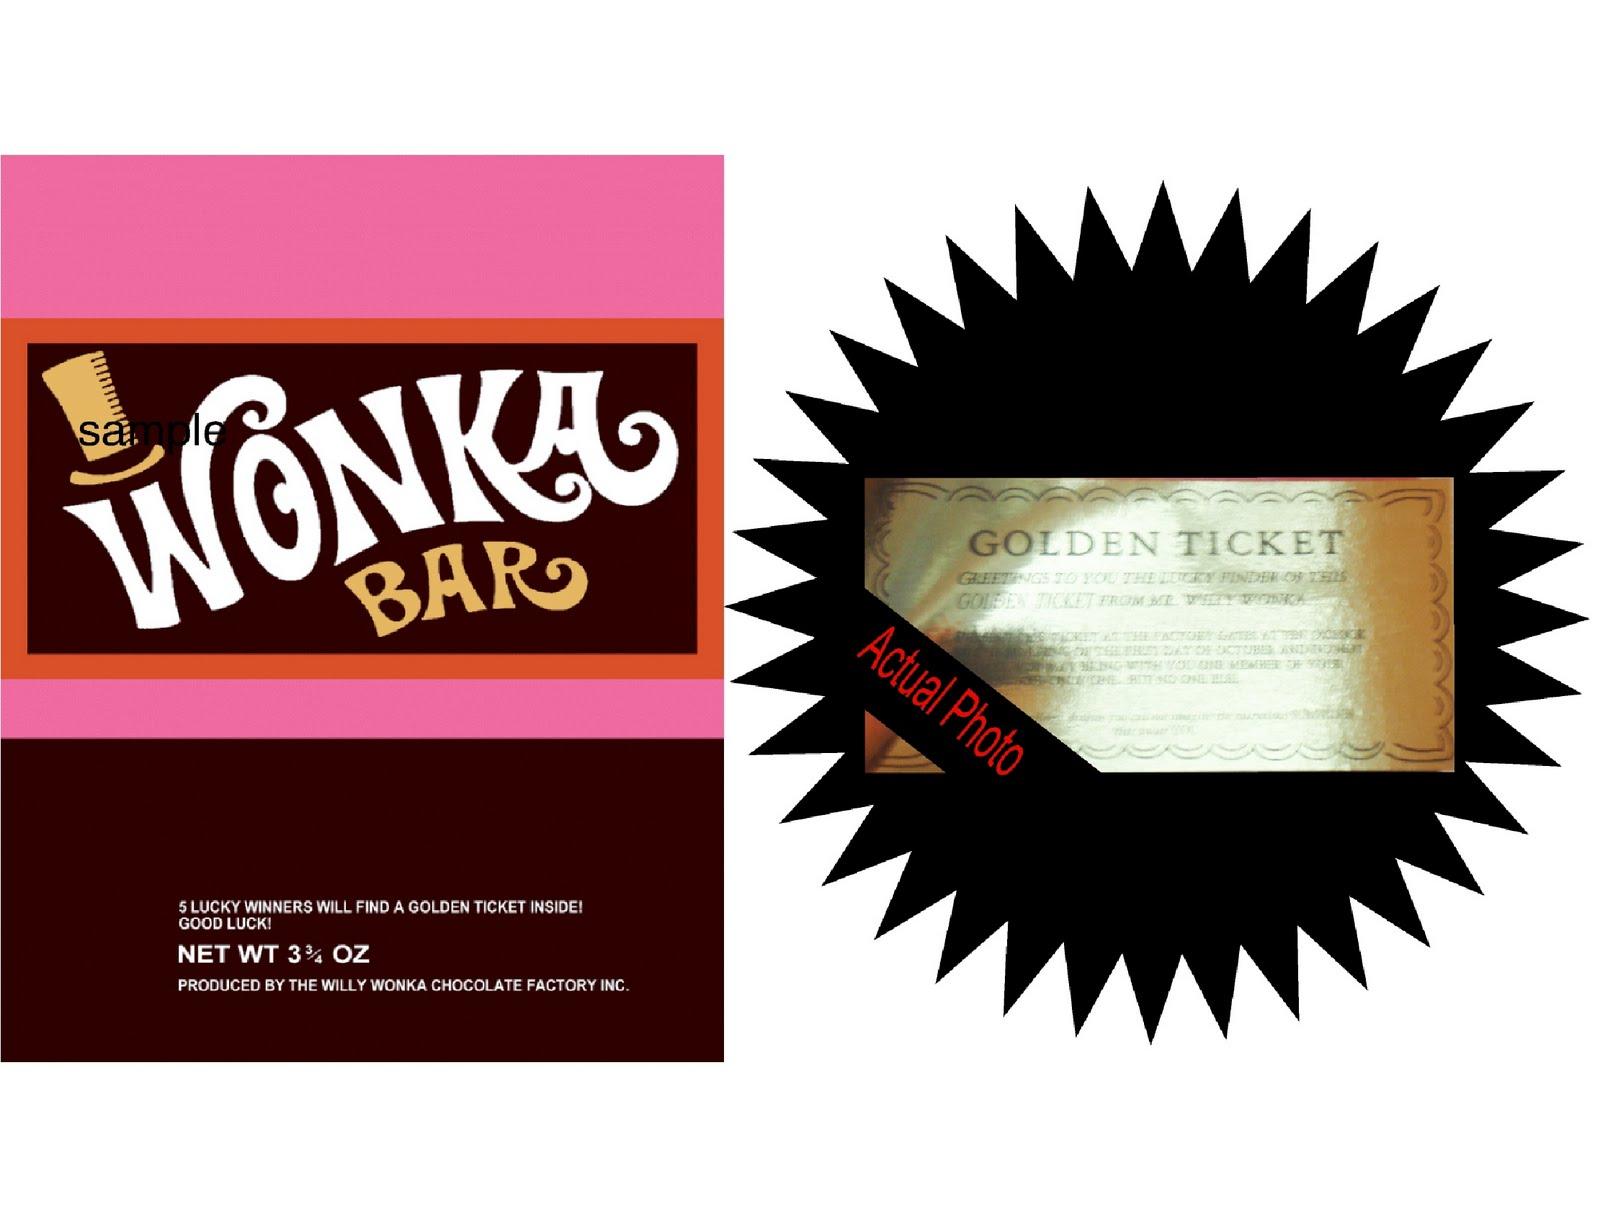 Wonka Bar Template - Home Design Ideas - Home Design Ideas - Free Printable Wonka Bar Wrapper Template